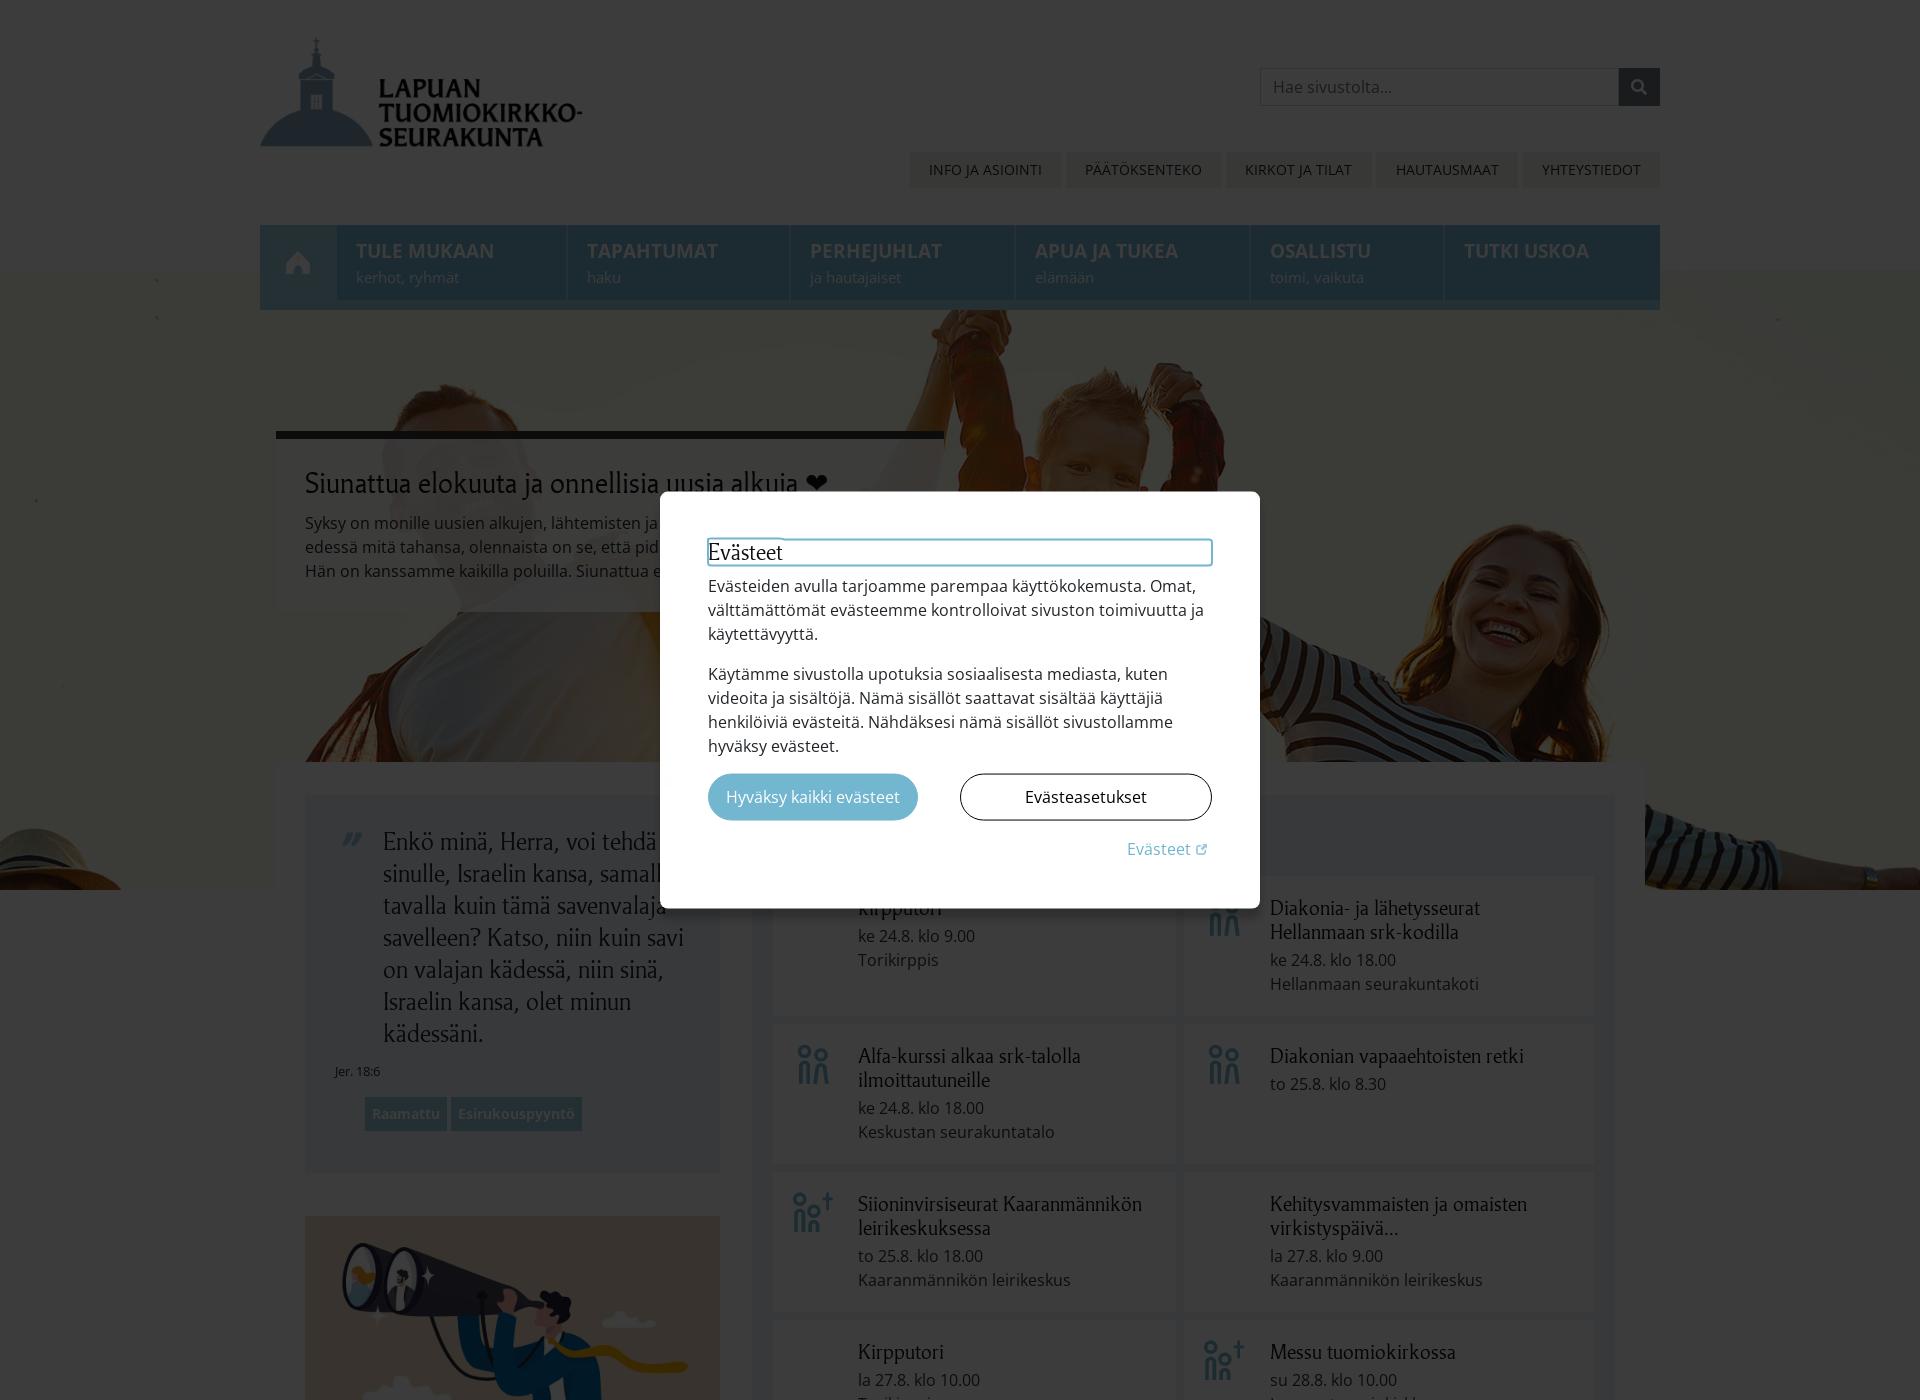 Screenshot for lapuantuomiokirkkoseurakunta.fi